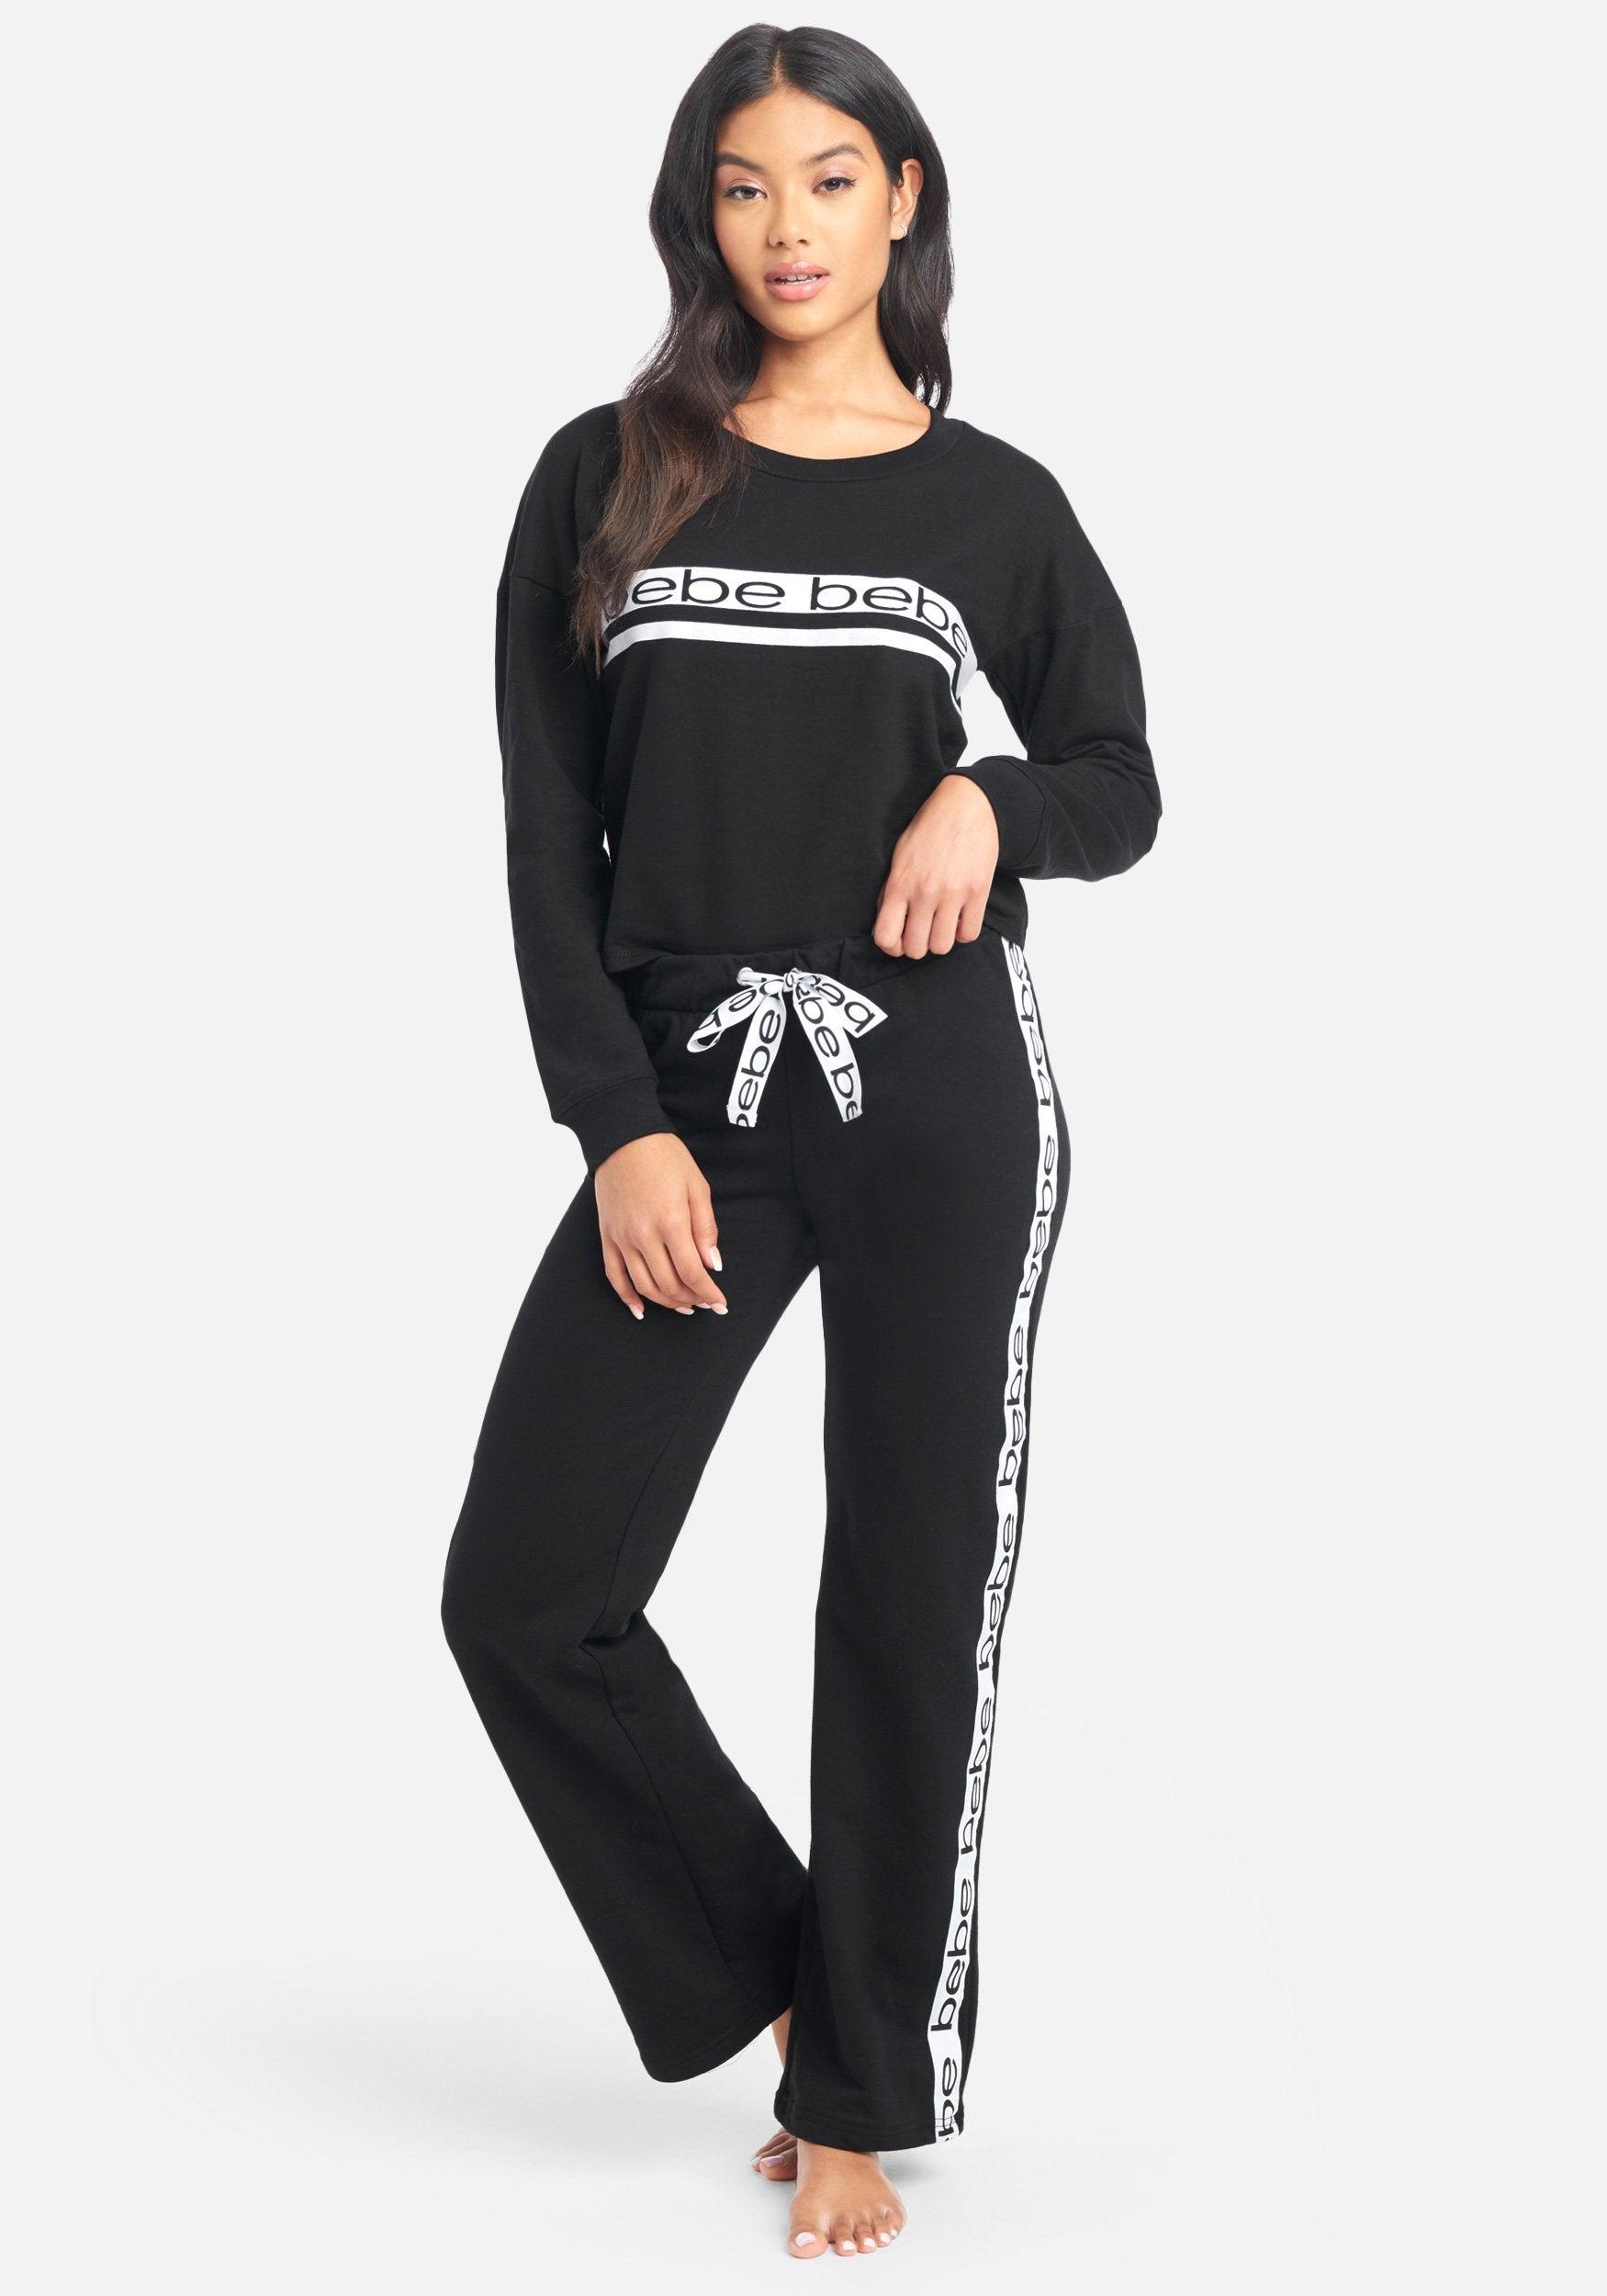 Bebe Women's Sport Stripe Pant Set, Size Small in Black Cotton